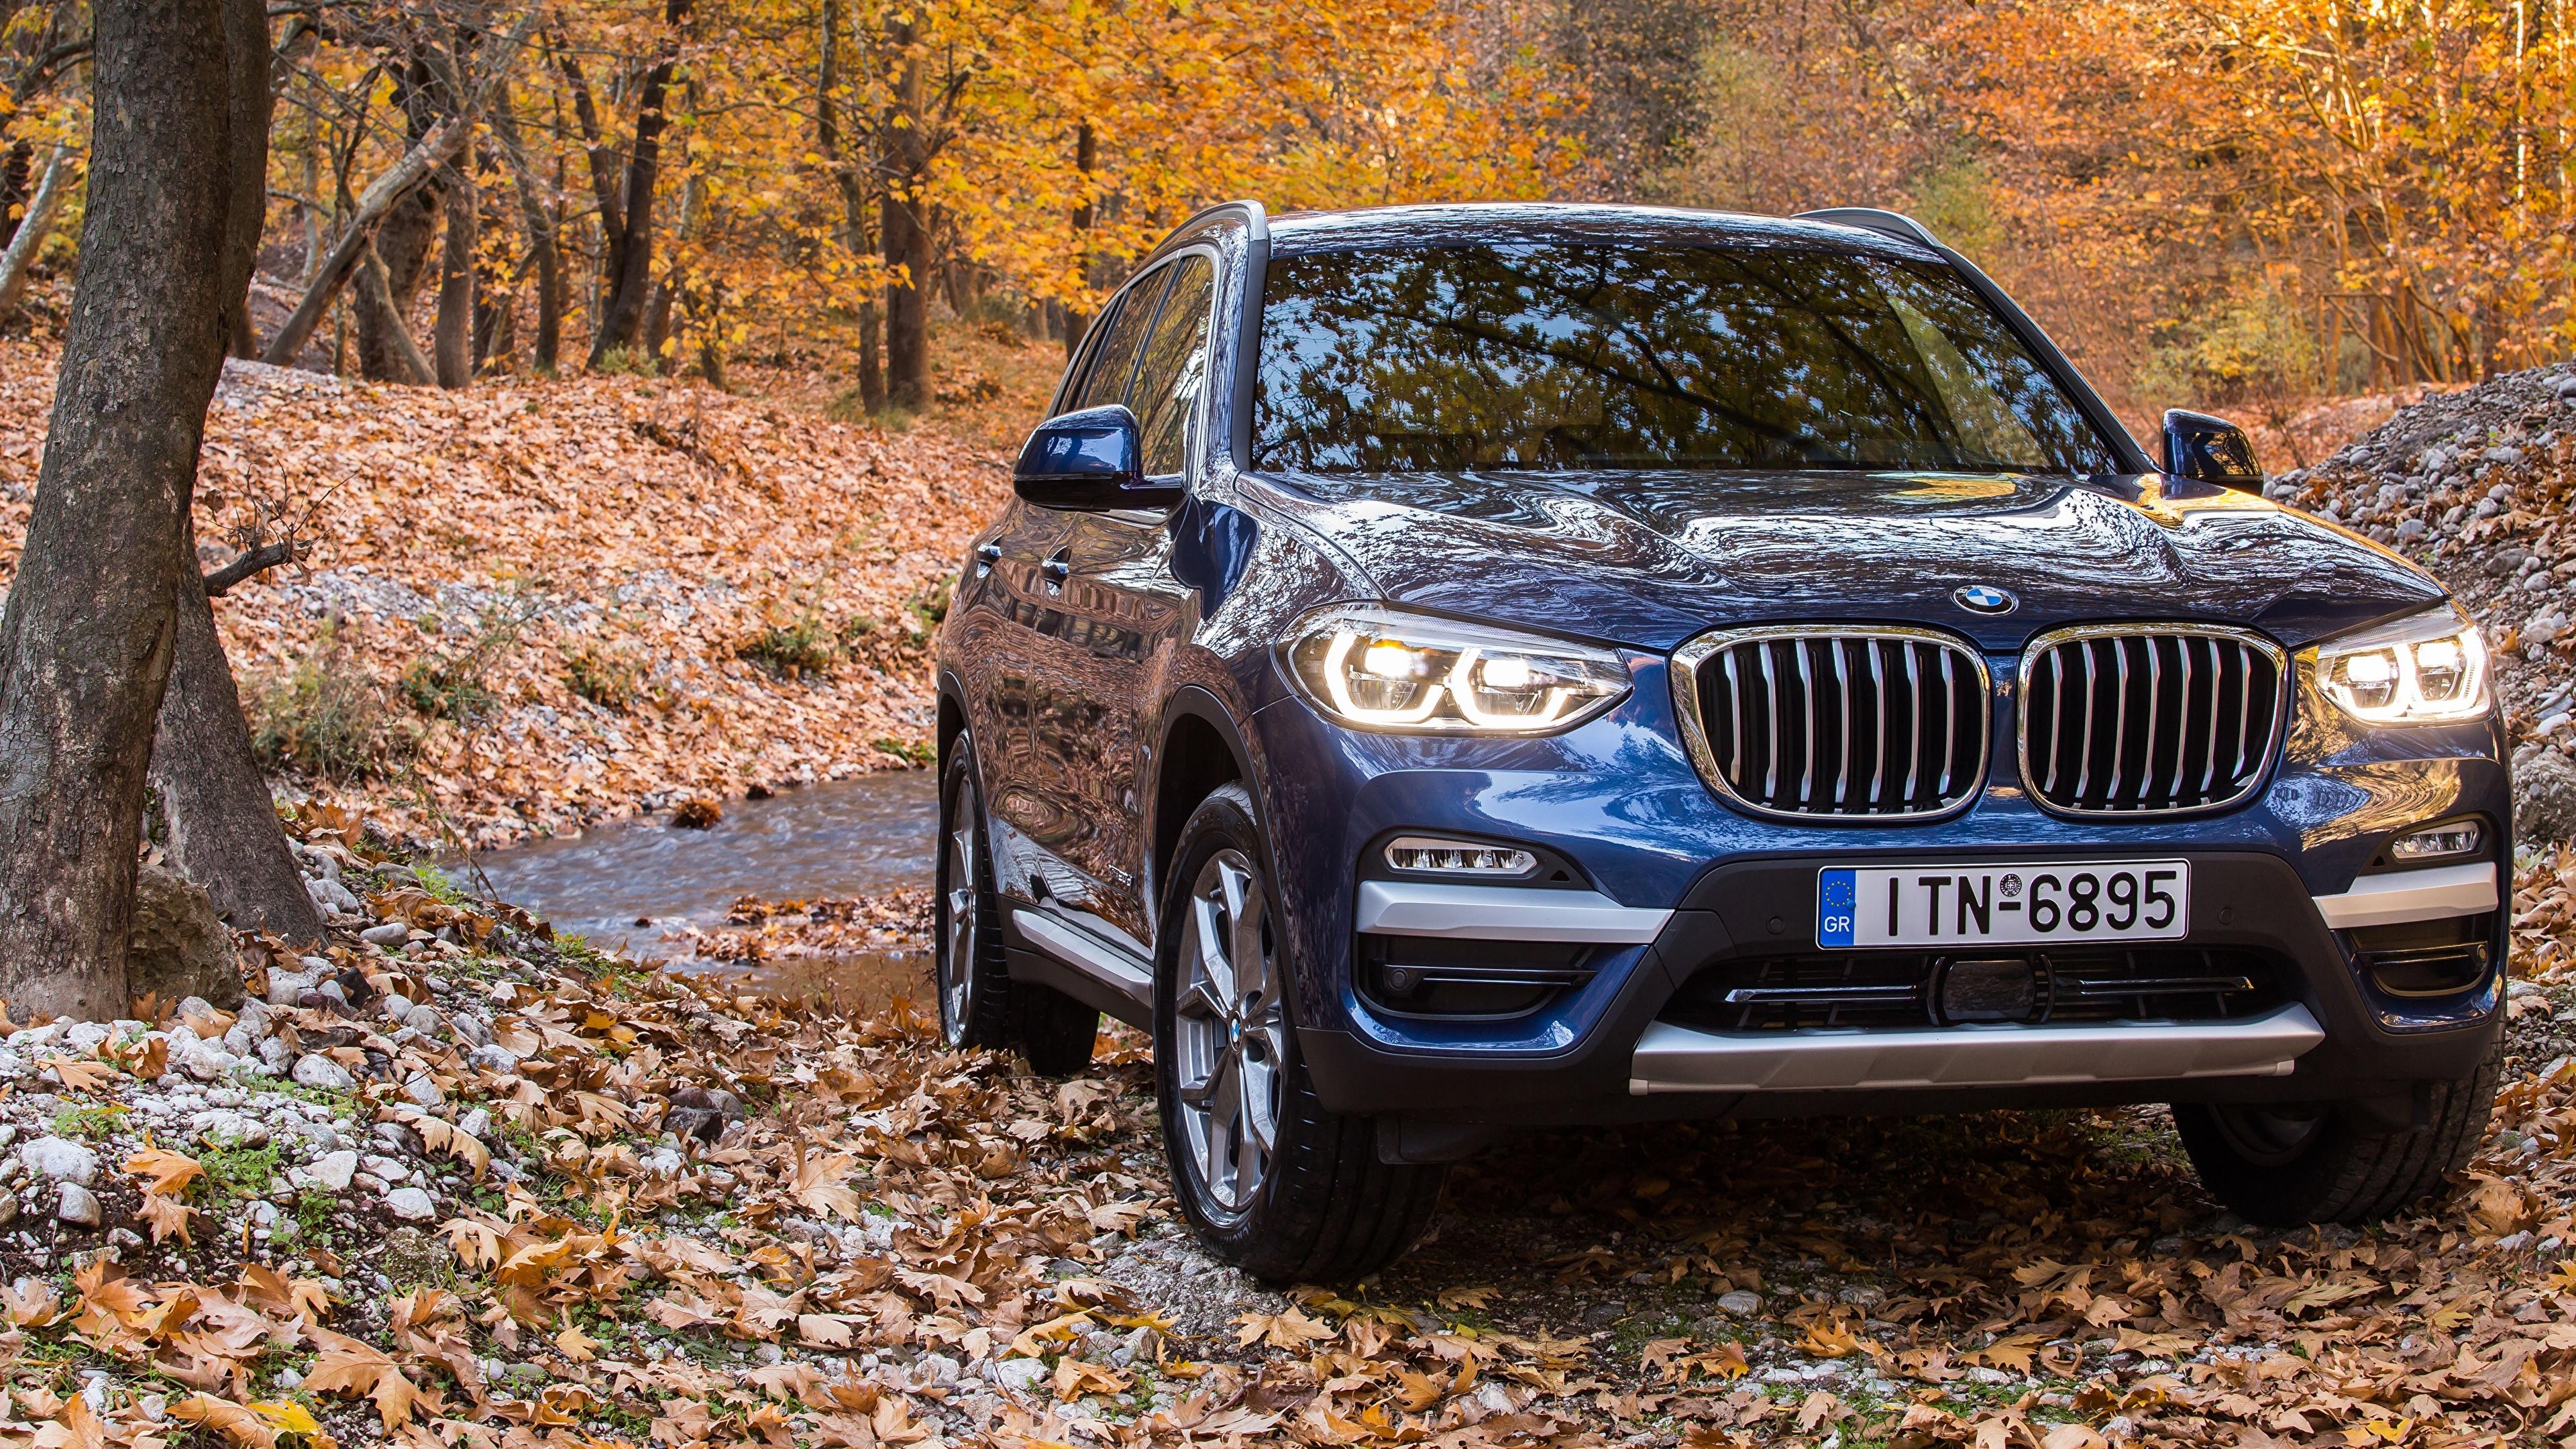 Фотографии BMW 2017 xLine X3 xDrive20d Синий Спереди Автомобили 3840x2160 БМВ синяя синие синих авто машины машина автомобиль